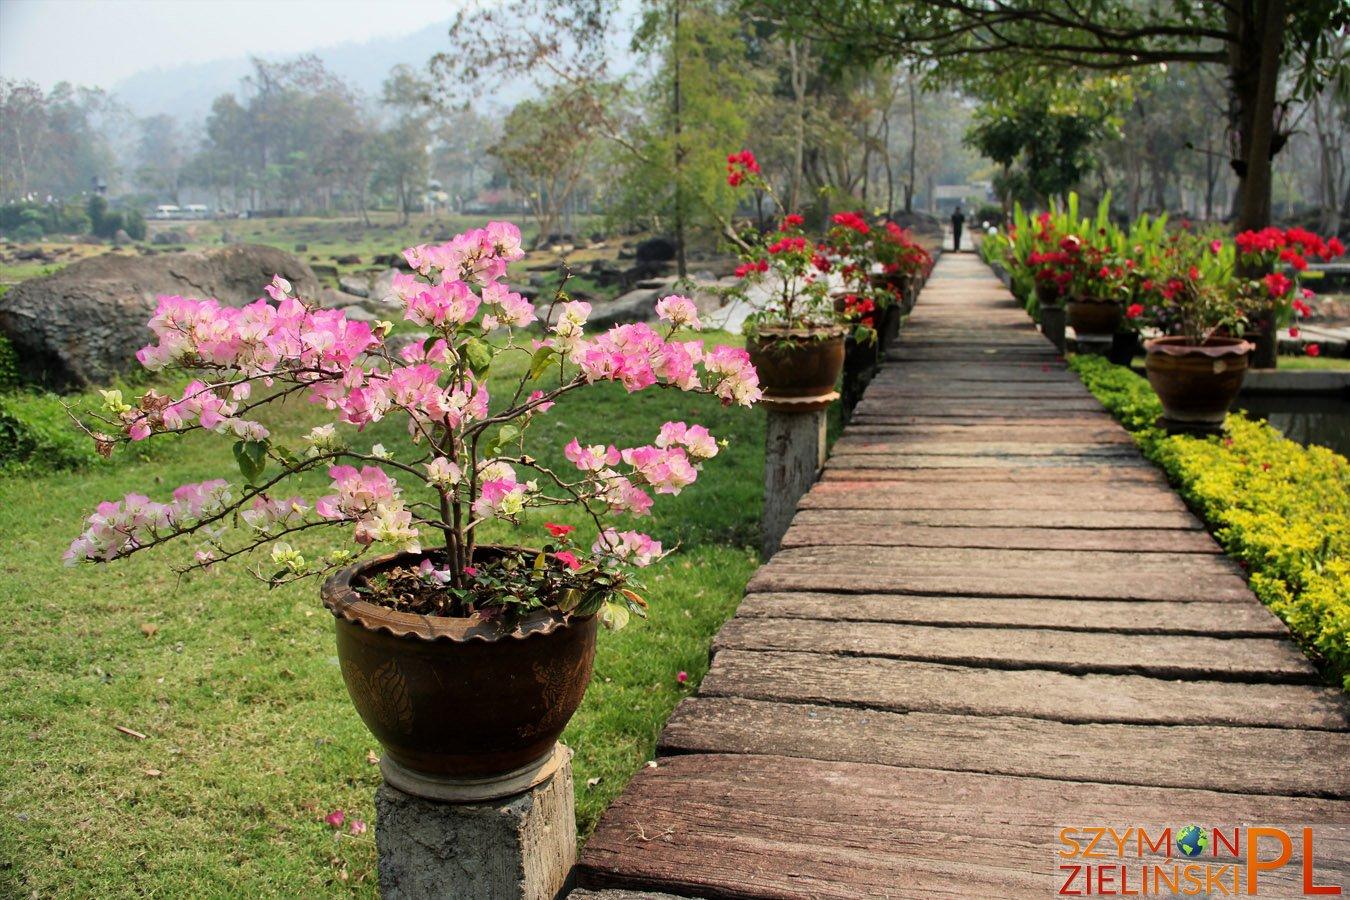 Doi Phahompok National Park, Chiang Mai province, Thailand